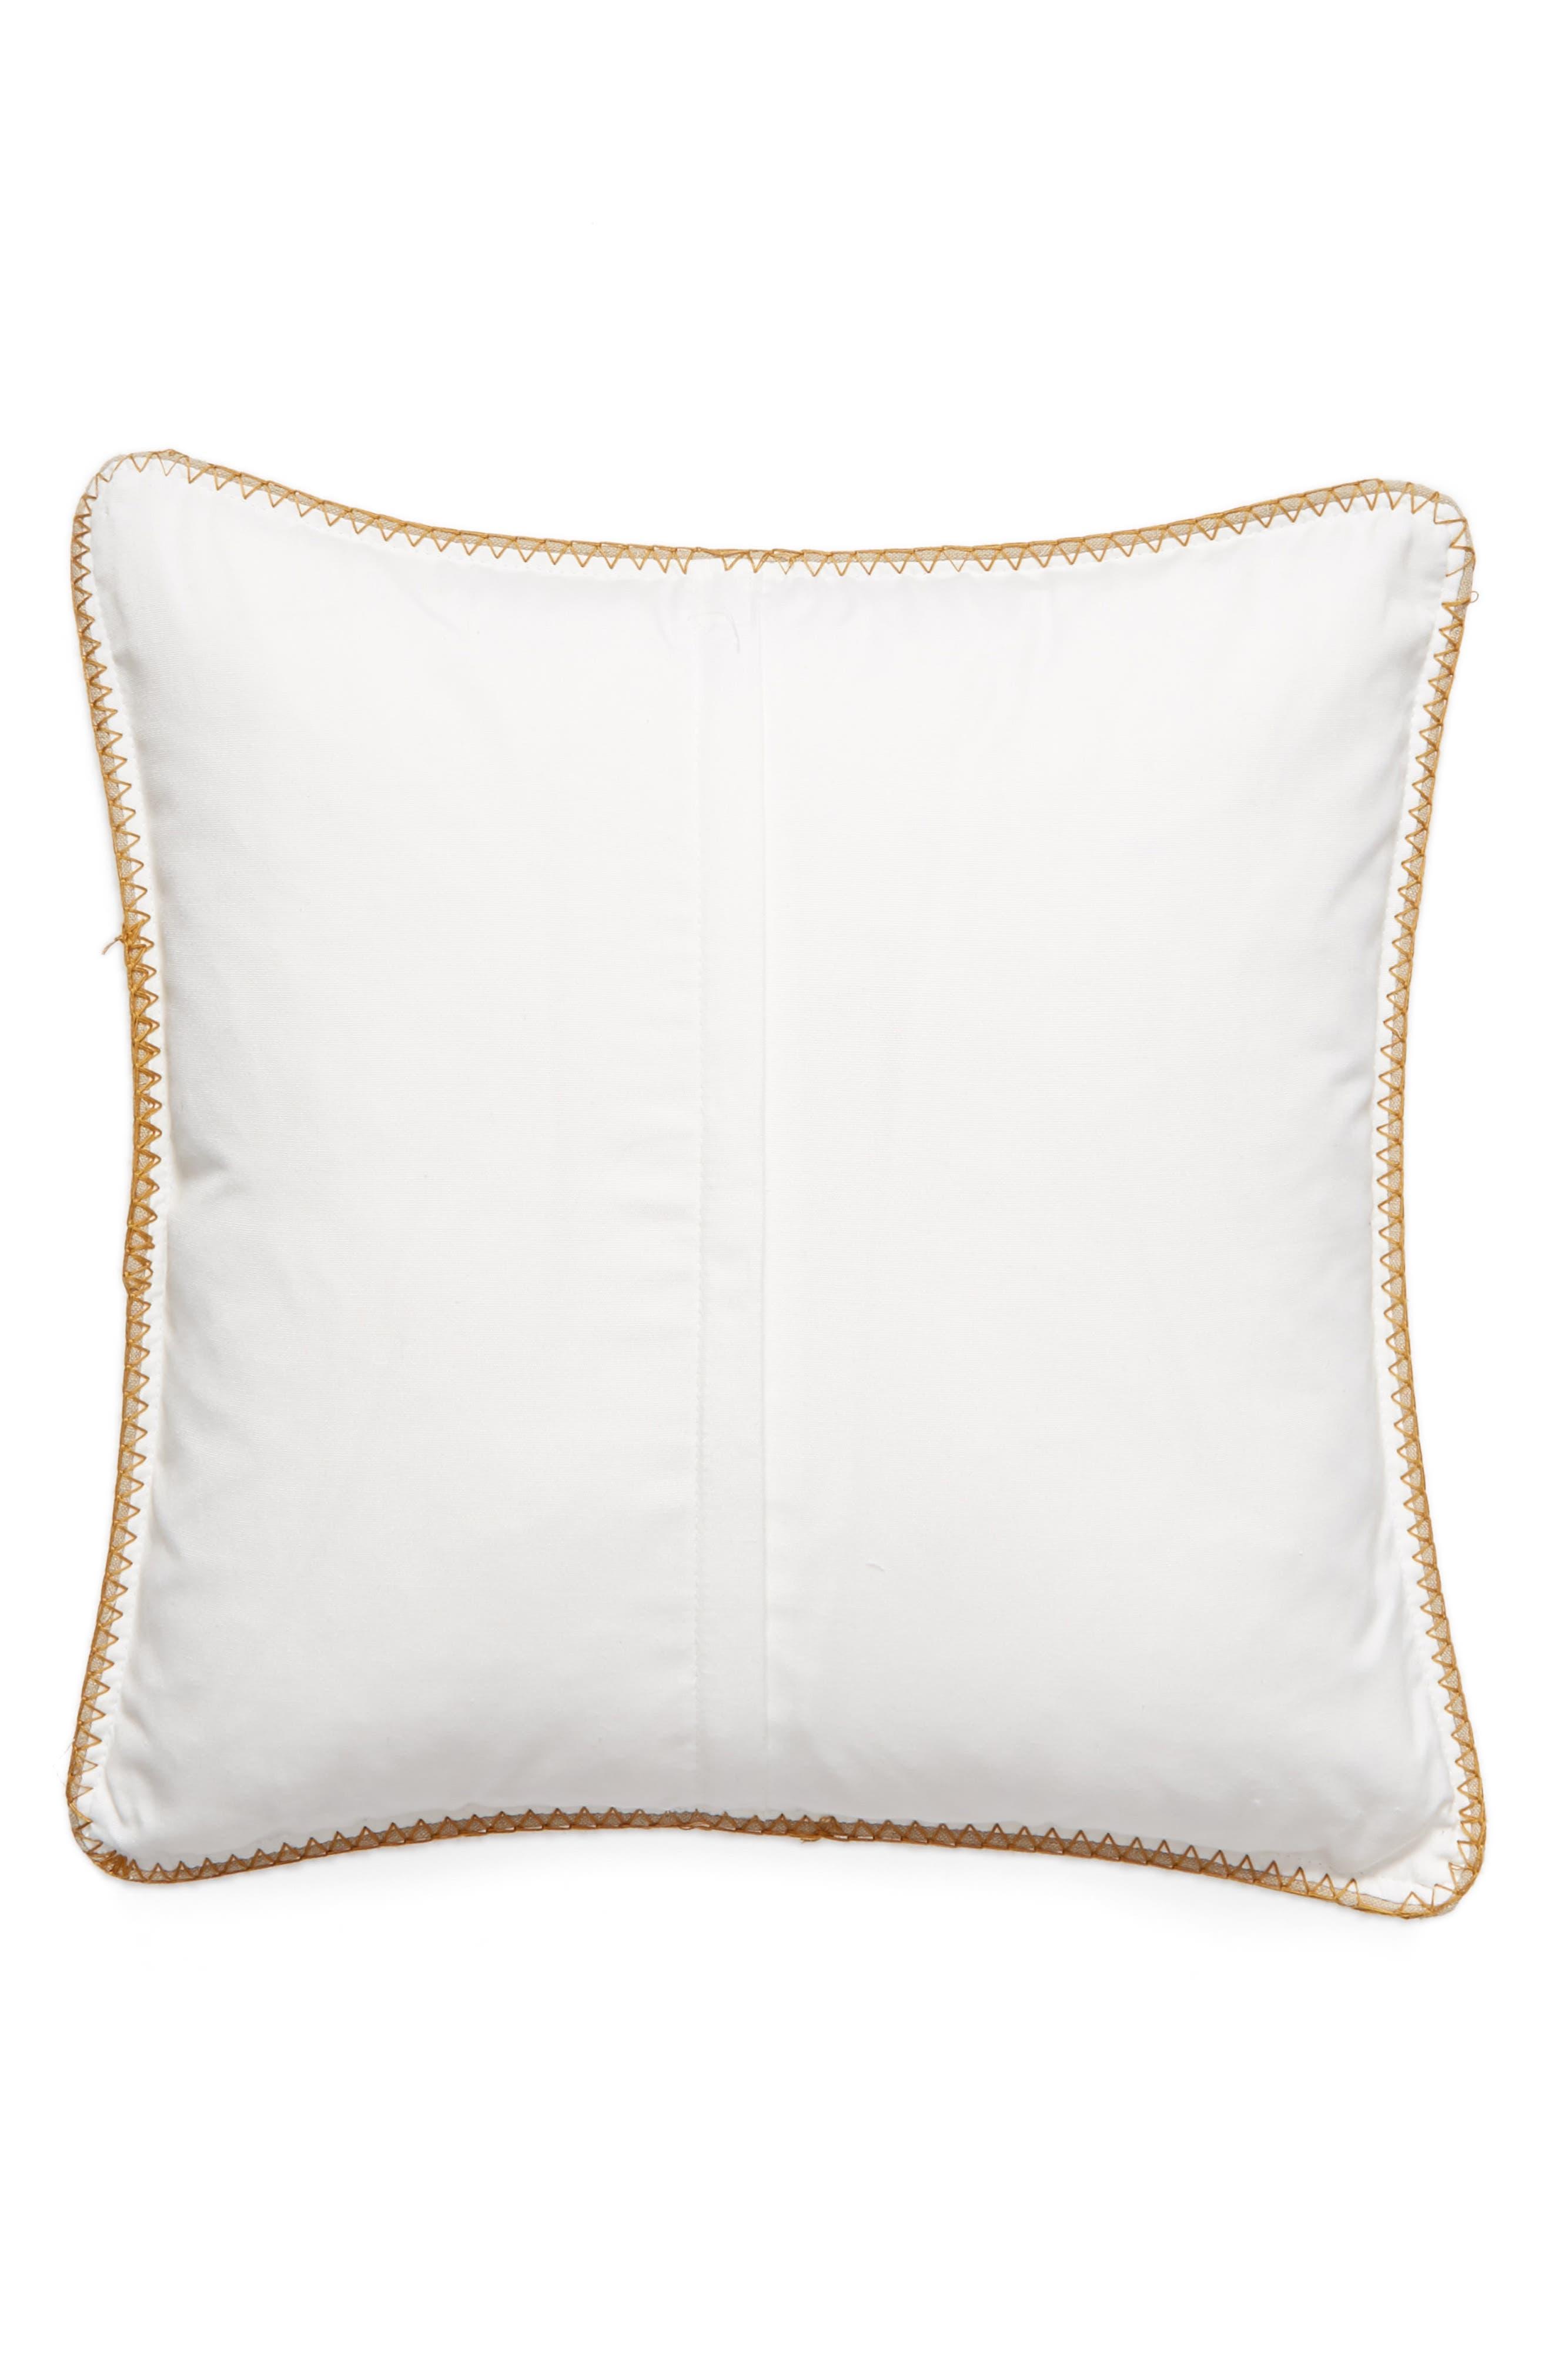 Jordan Skull Accent Pillow,                             Alternate thumbnail 2, color,                             900